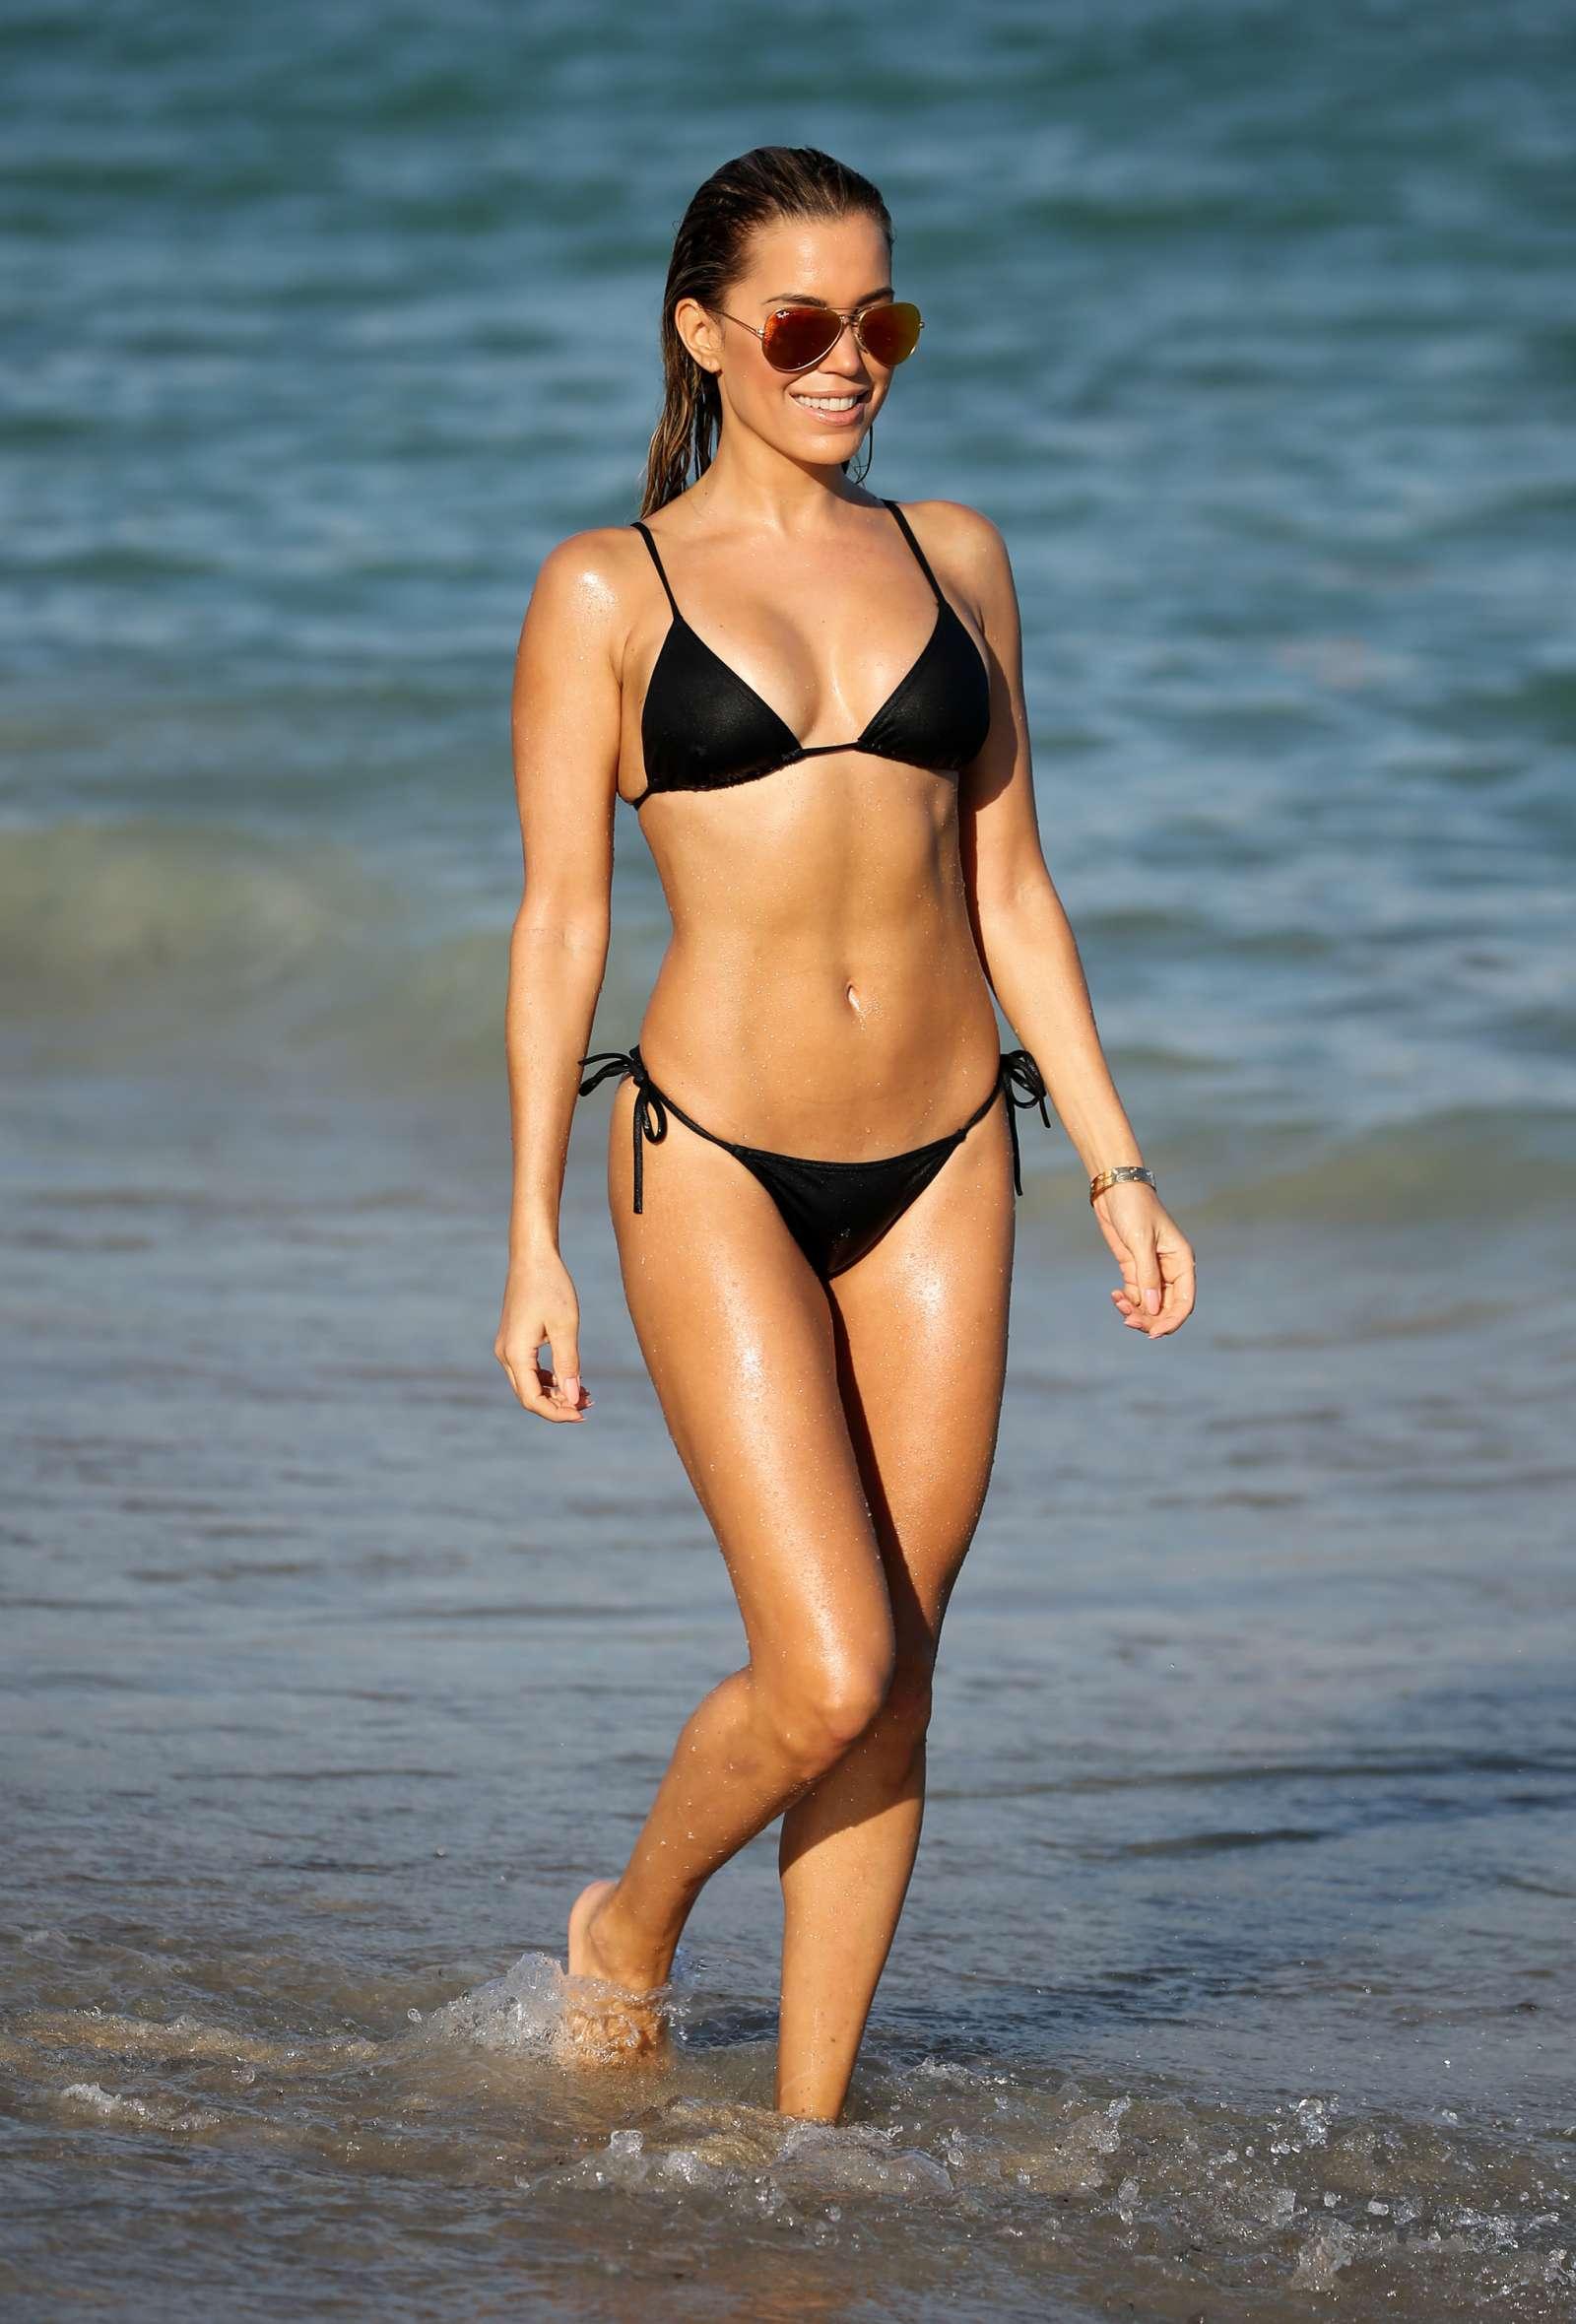 Sylvie Meis 2017 : Sylvie Meis in Black Bikini 2017 -03